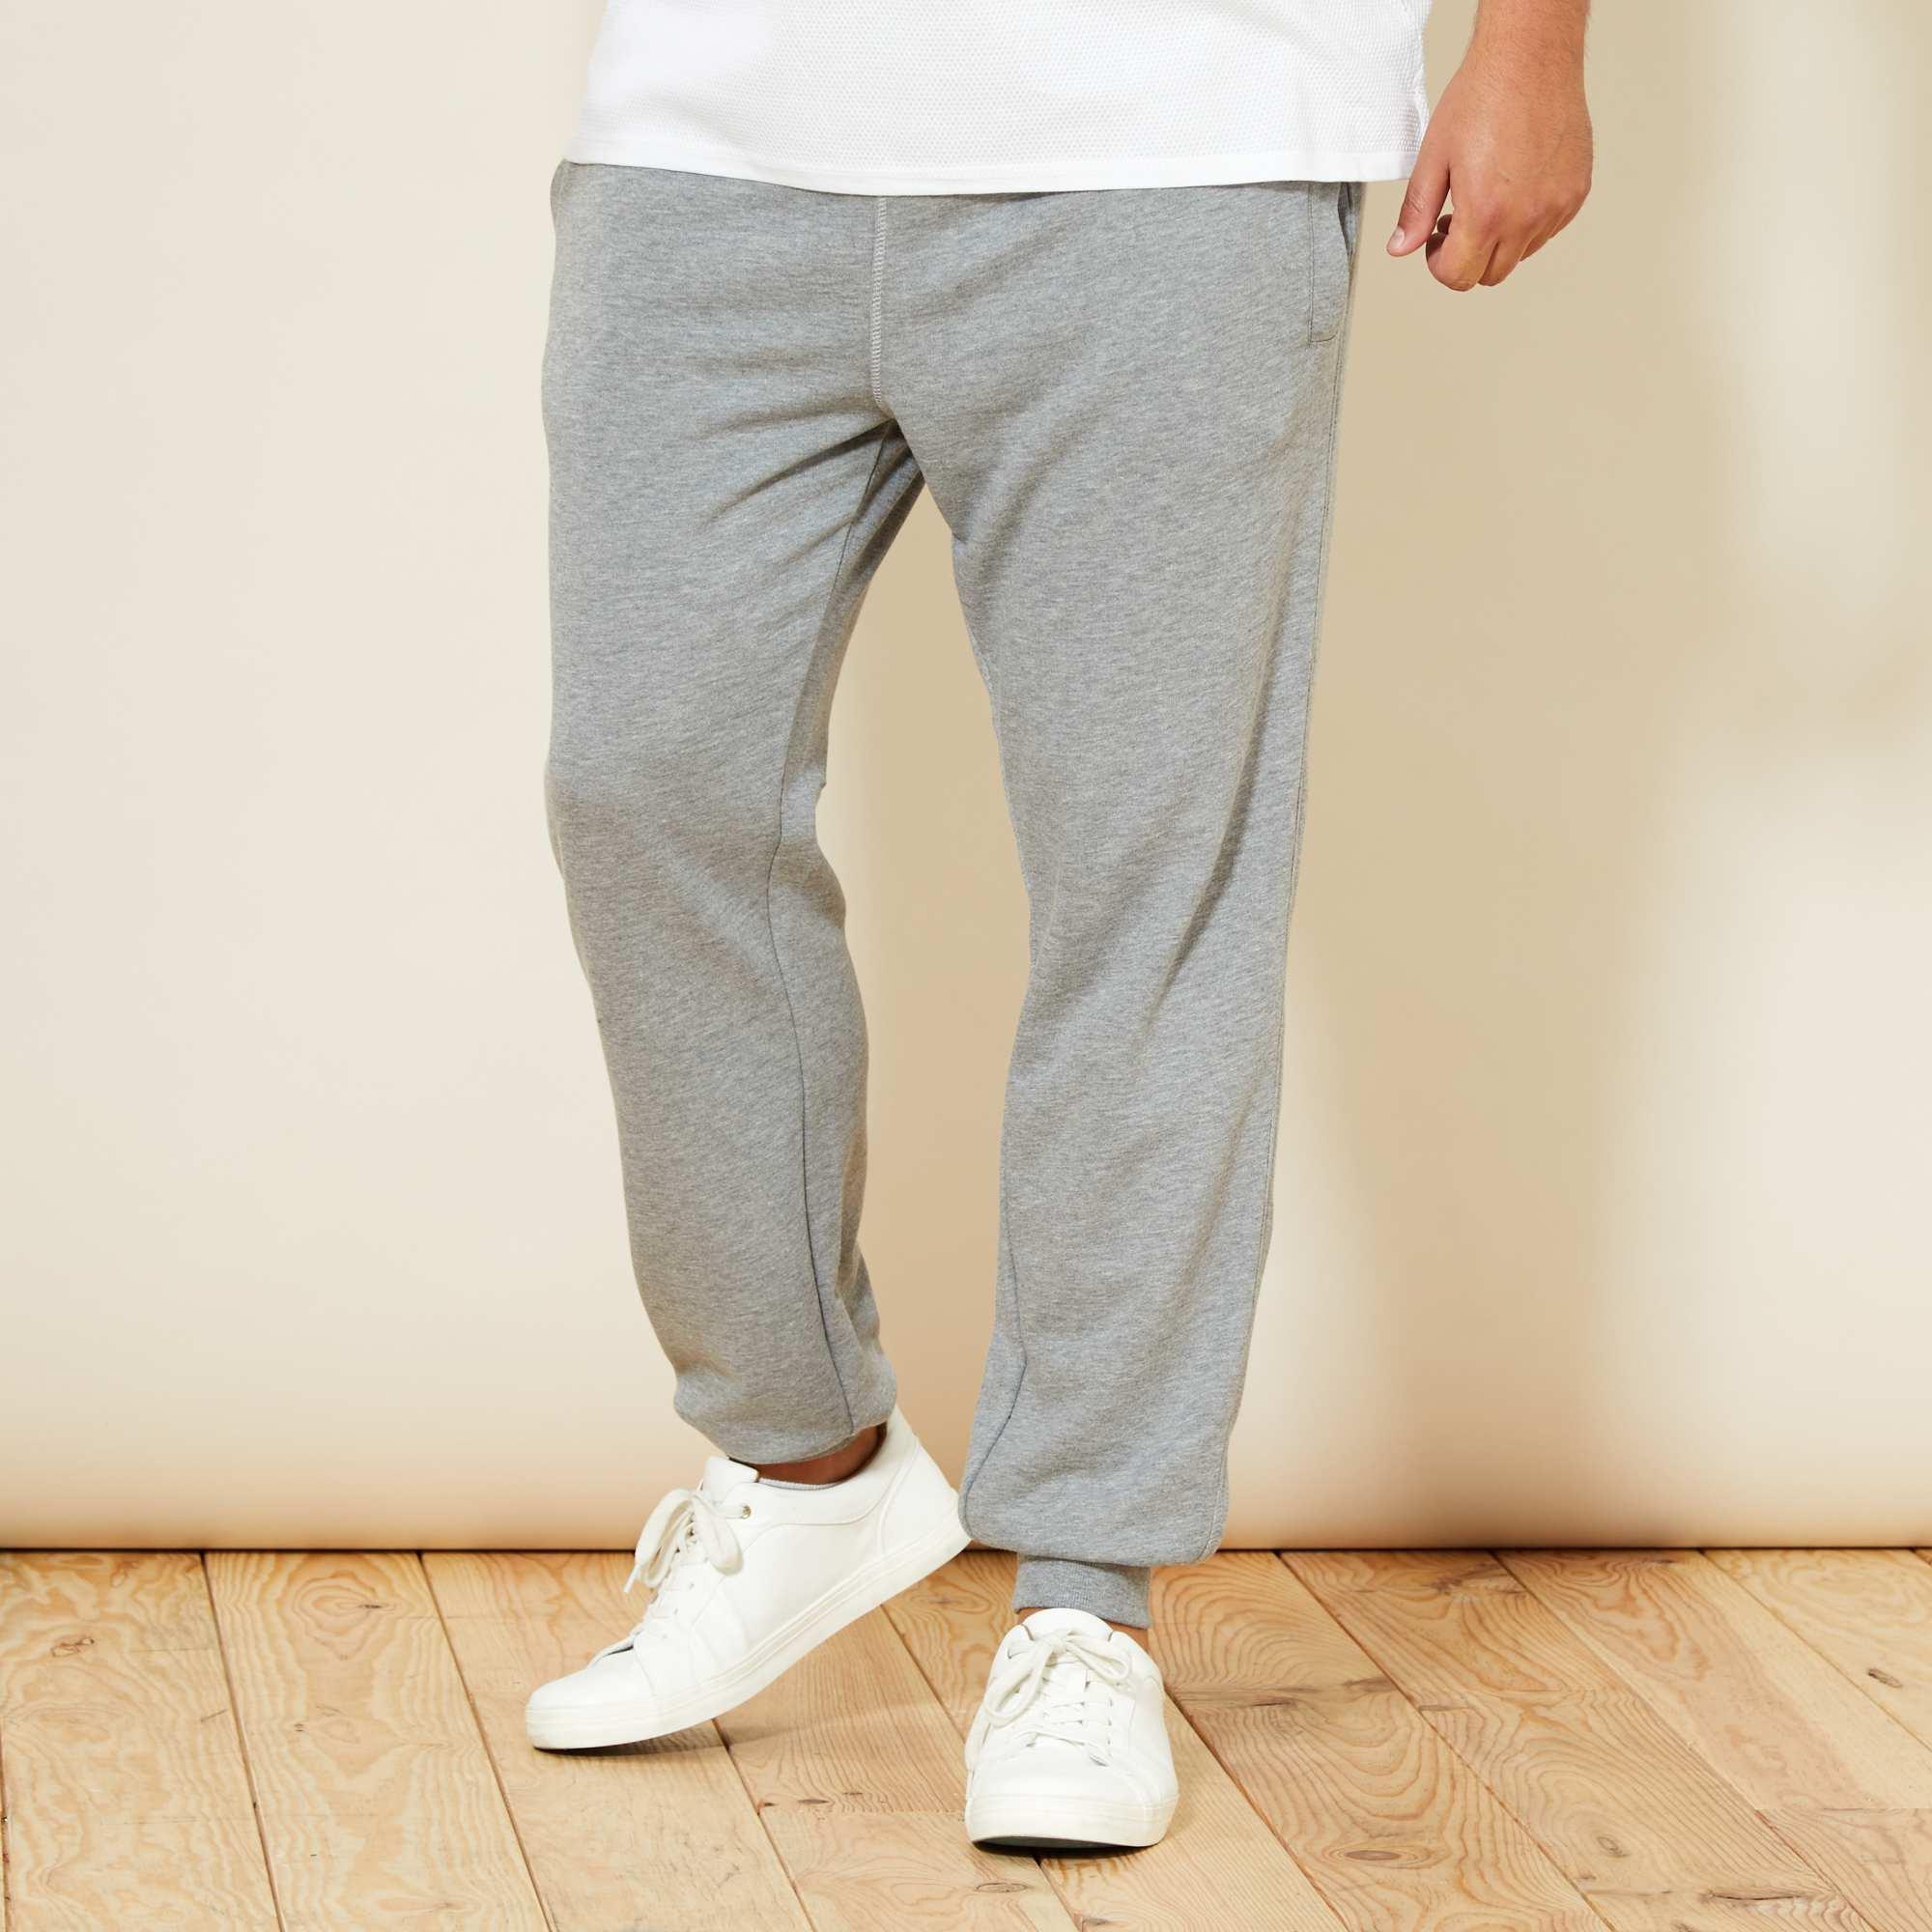 pantalon en molleton grande taille homme kiabi 9 10. Black Bedroom Furniture Sets. Home Design Ideas